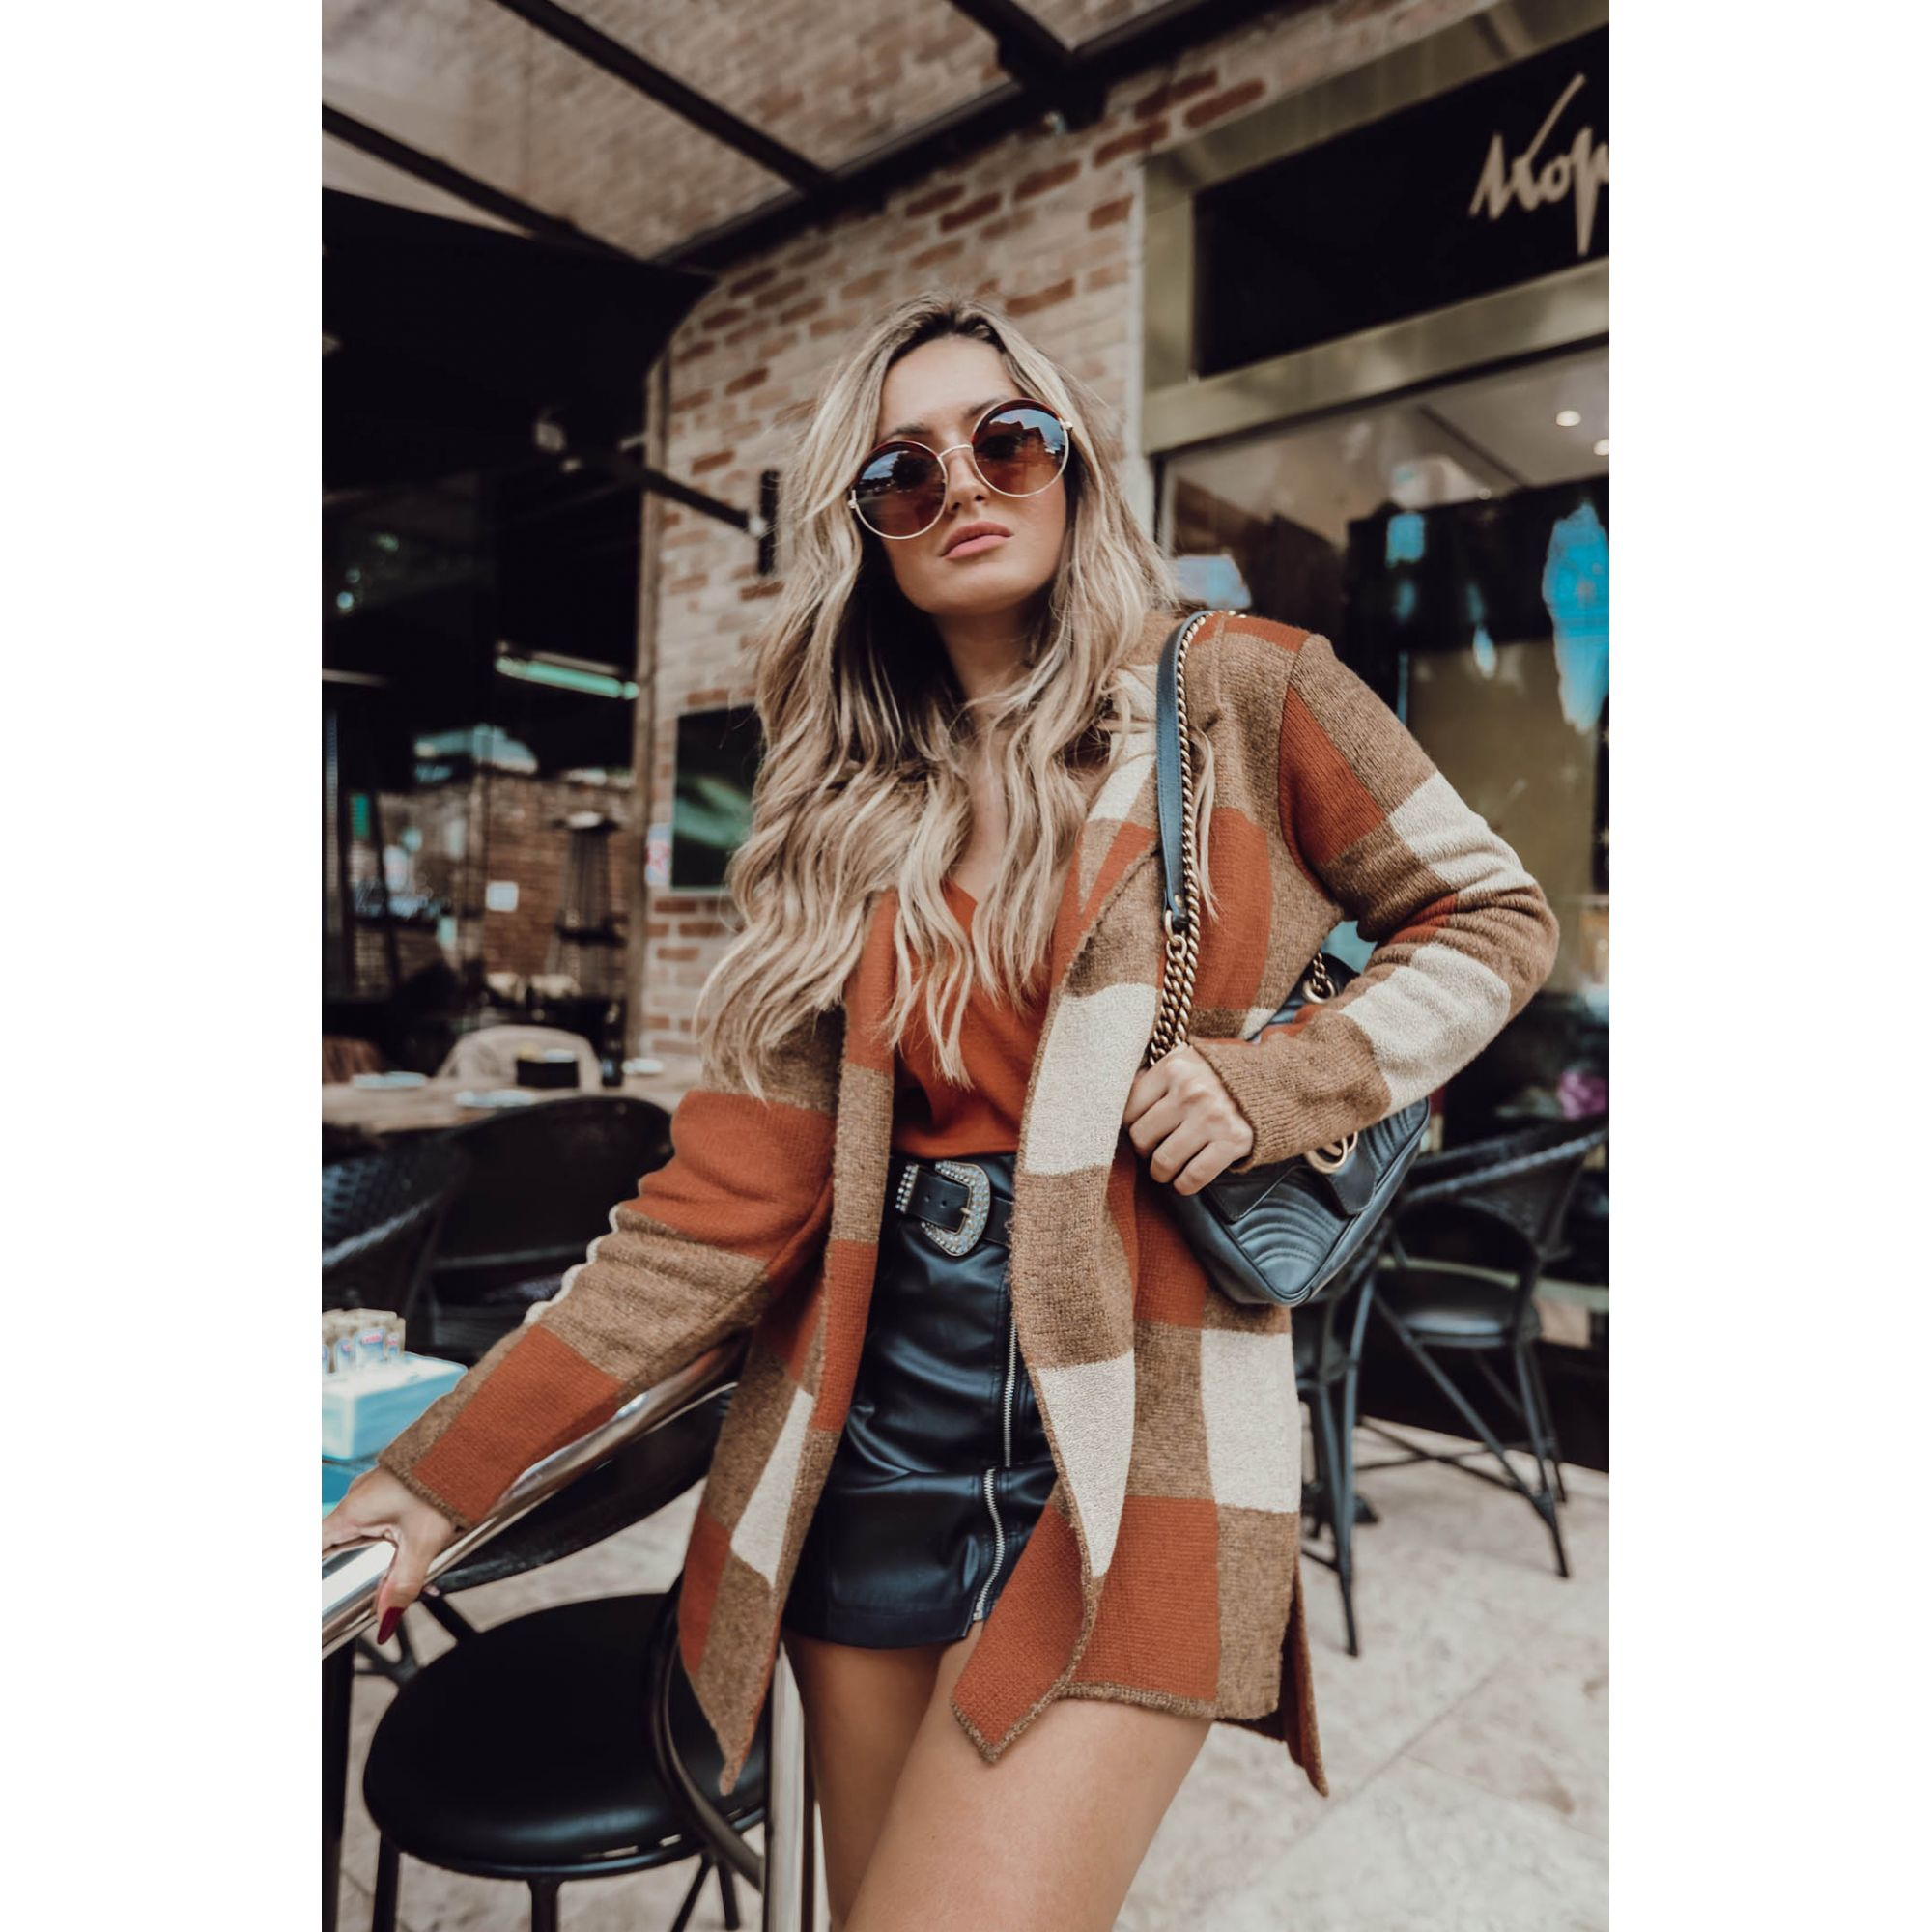 Casaco Quadriculado Vera Tricot Mullet Gola Blazer Feminino Marrom / Bege